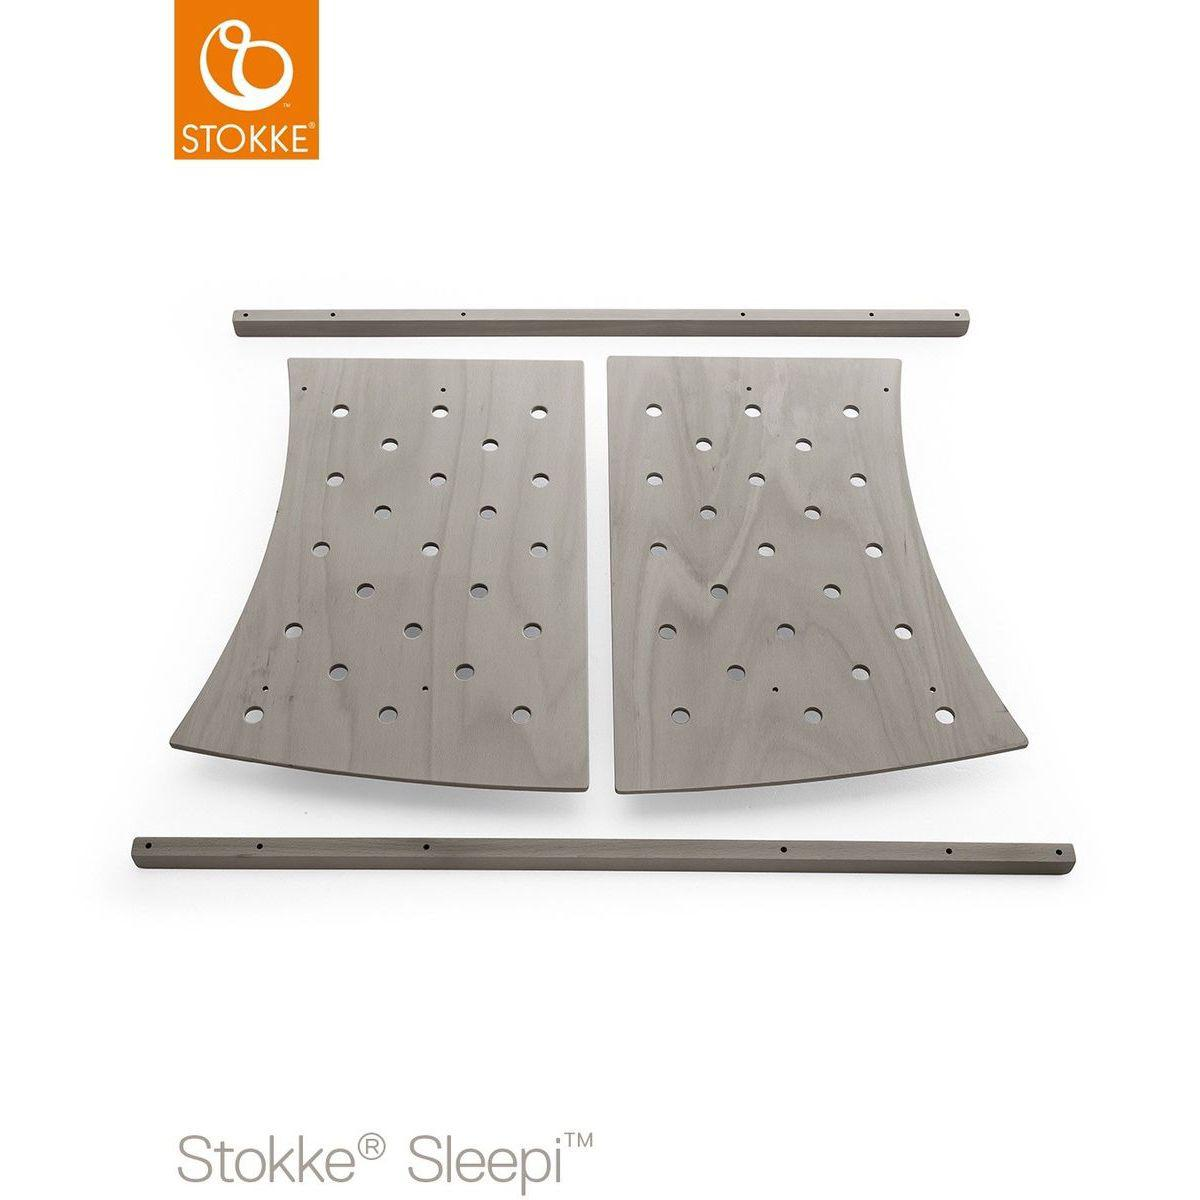 Kit extension lit junior SLEEPI Stokke gris brume